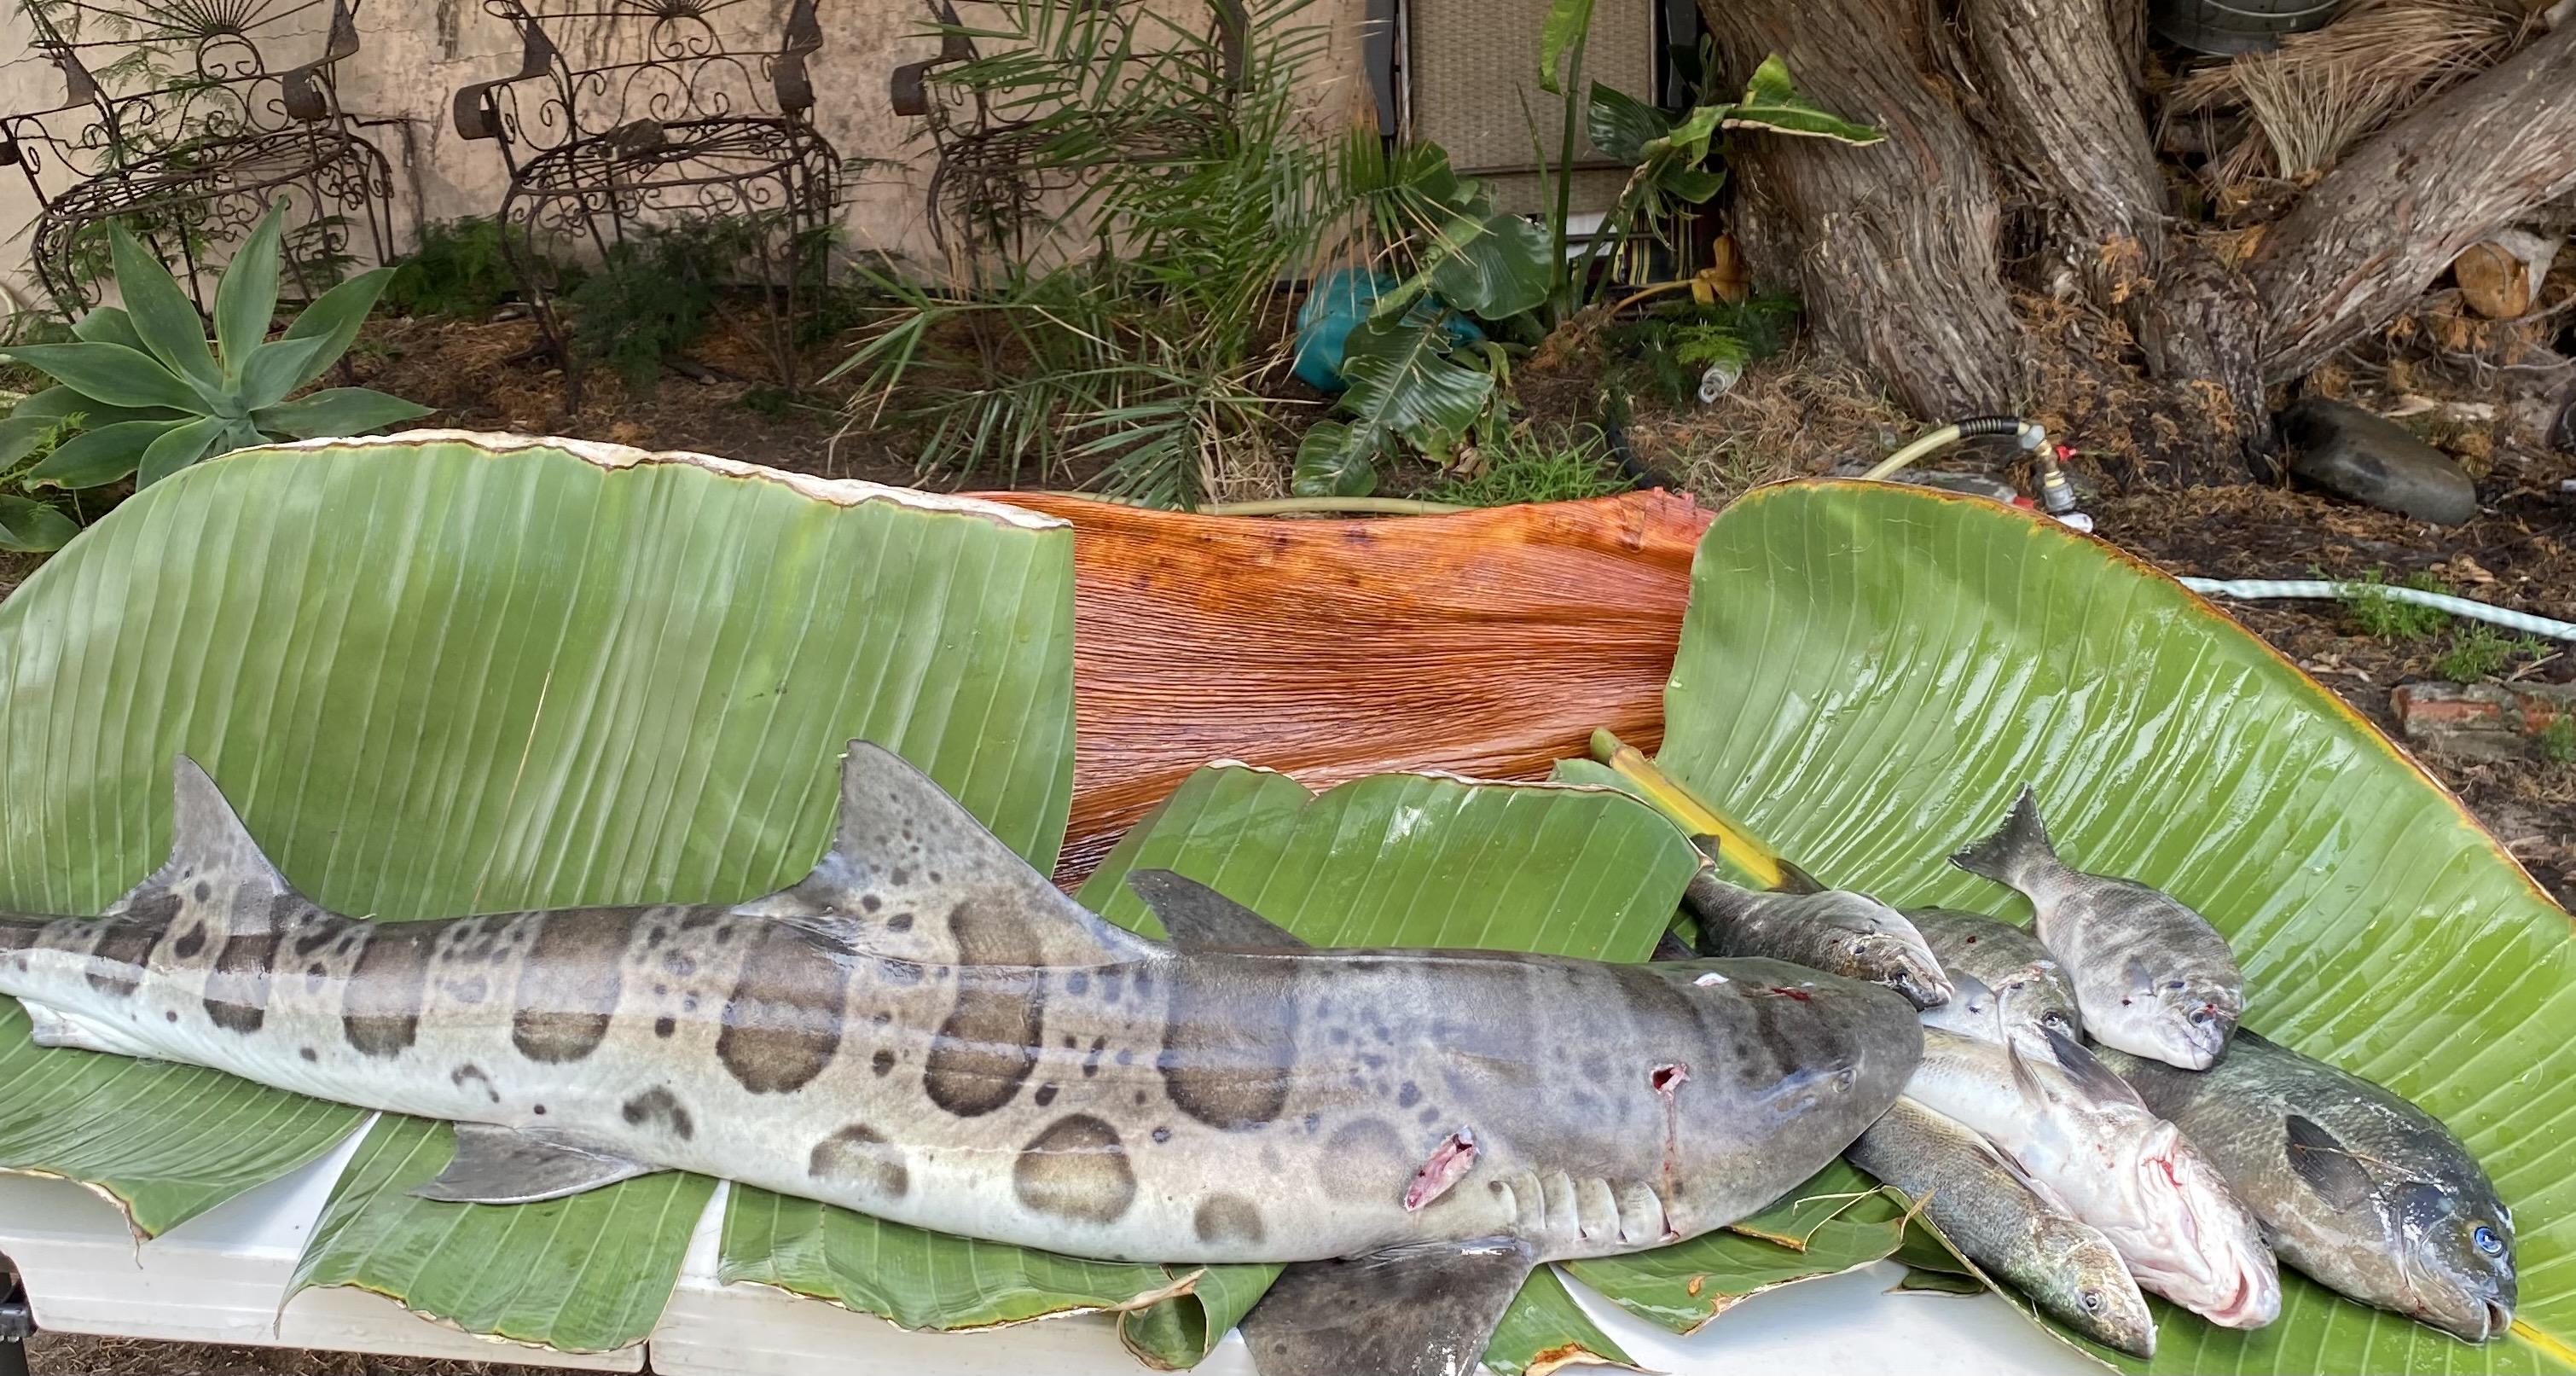 leopard shark tacos